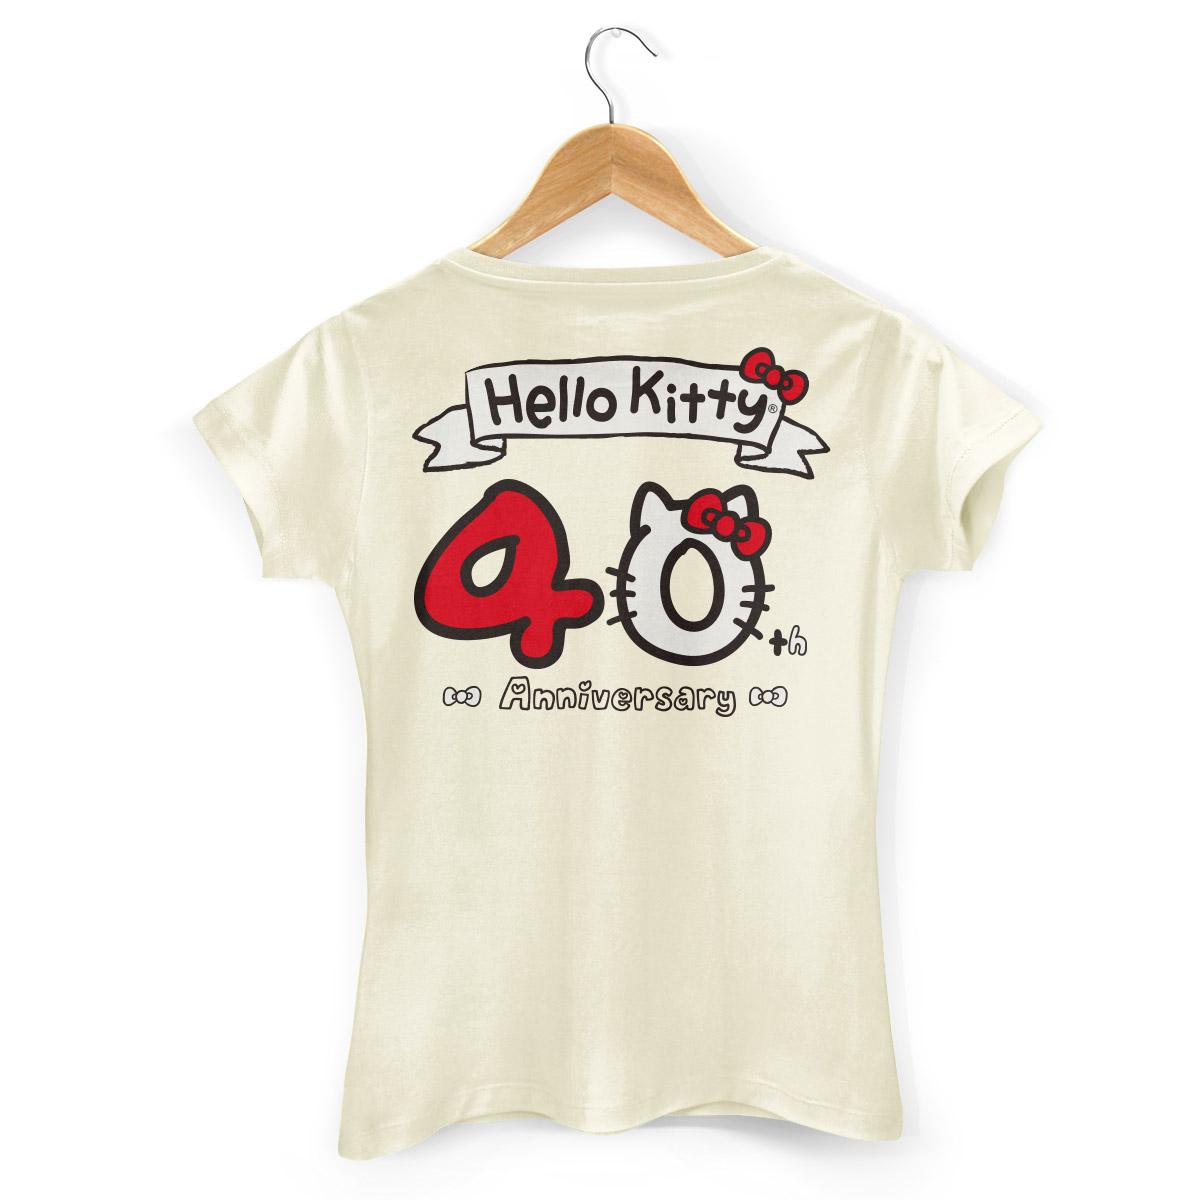 Camiseta Hello Kitty 40th Anniversary